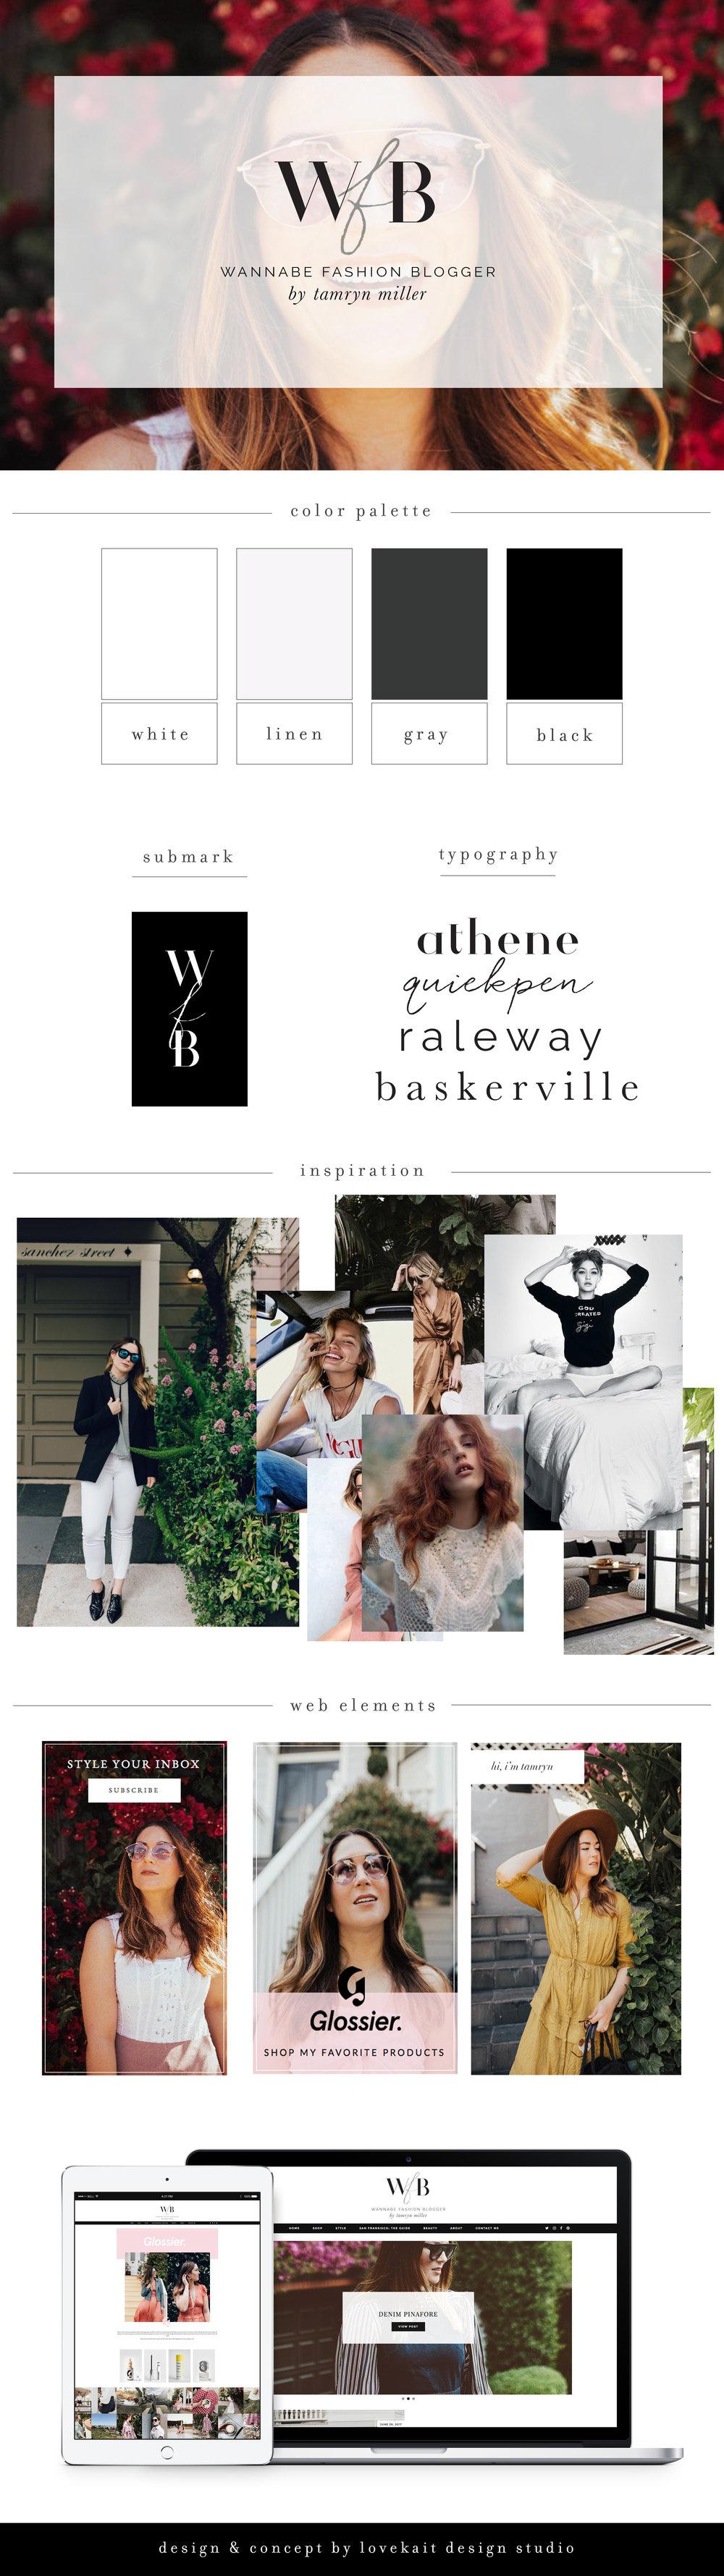 Wordpress Web Design + Fashion Bloggers + Wannabe Fashion Blogger, Glossier